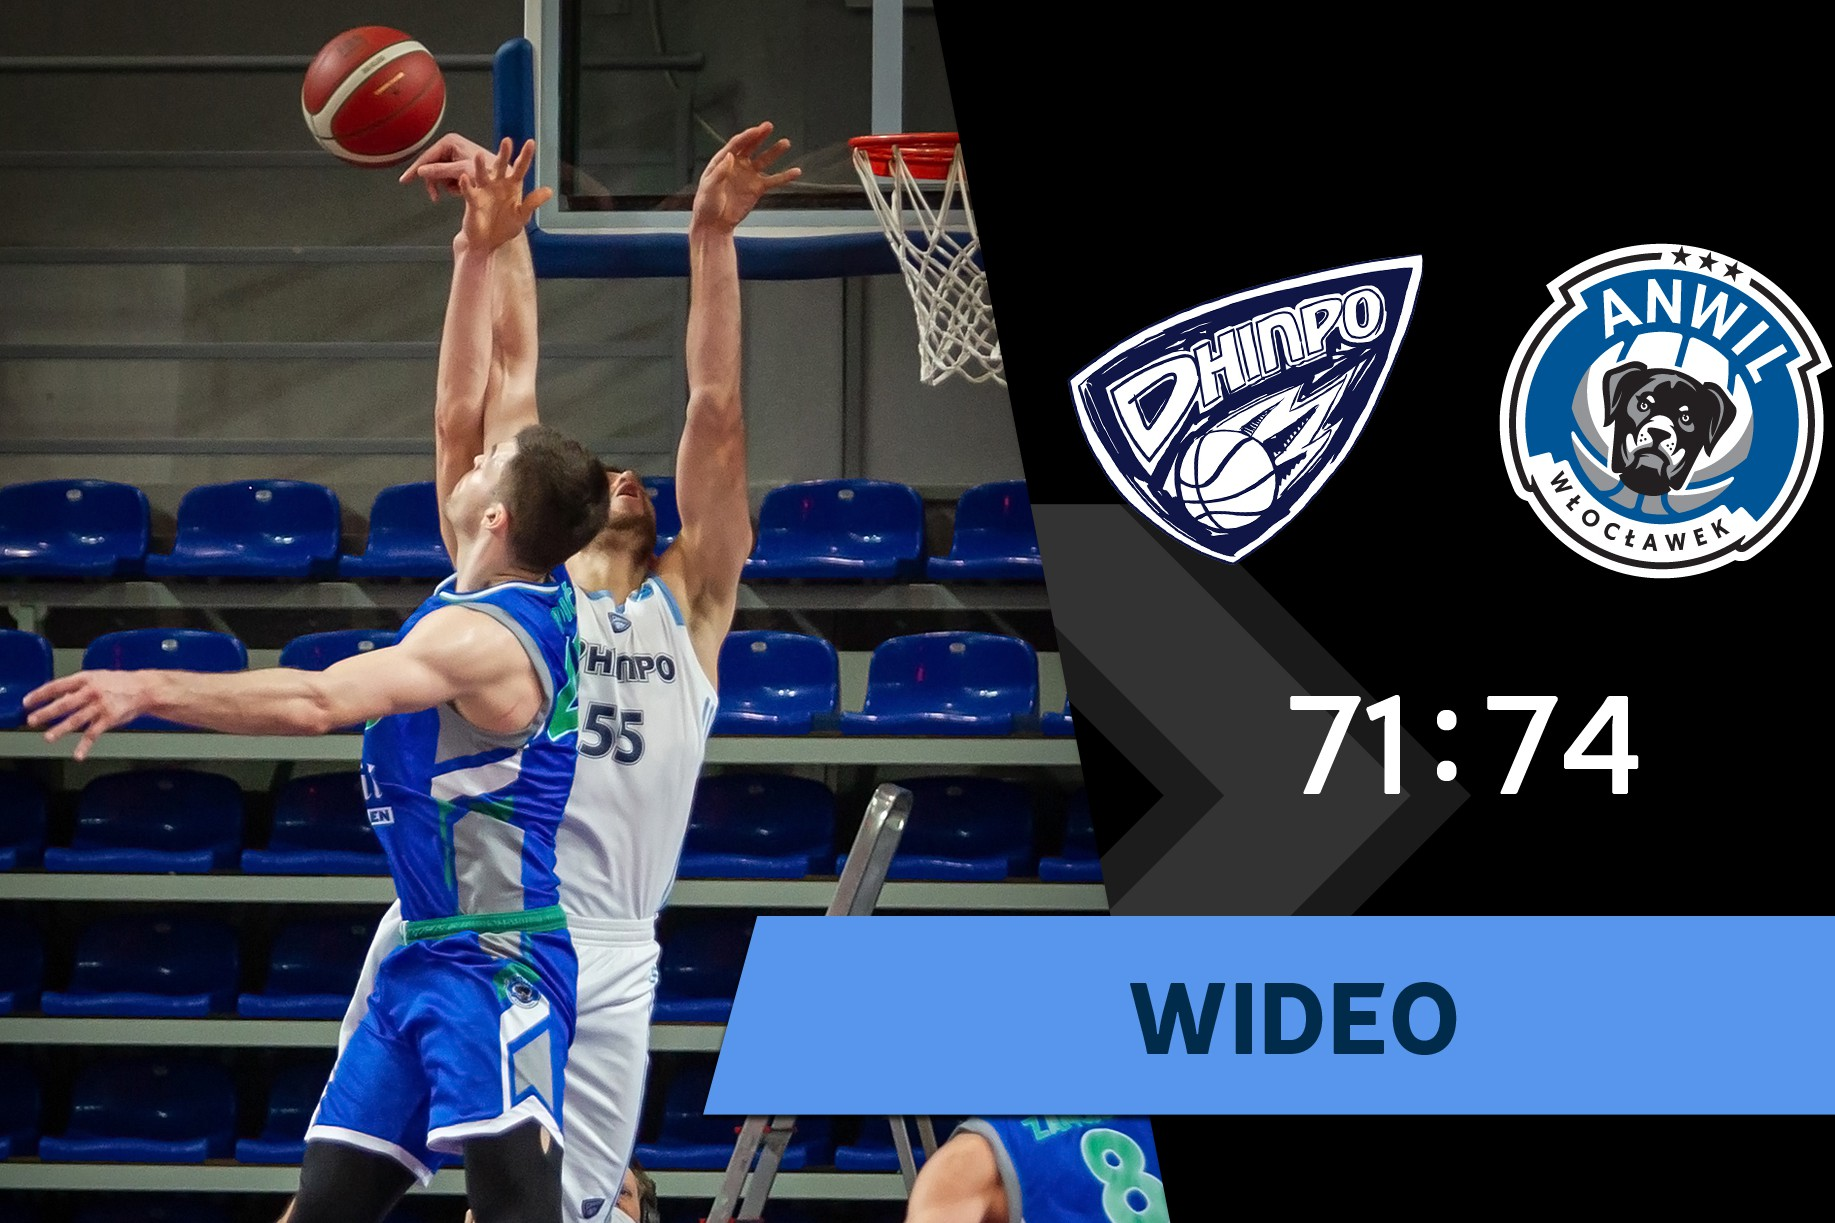 Wideo | BC Dnipro - Anwil Włocławek 71:74